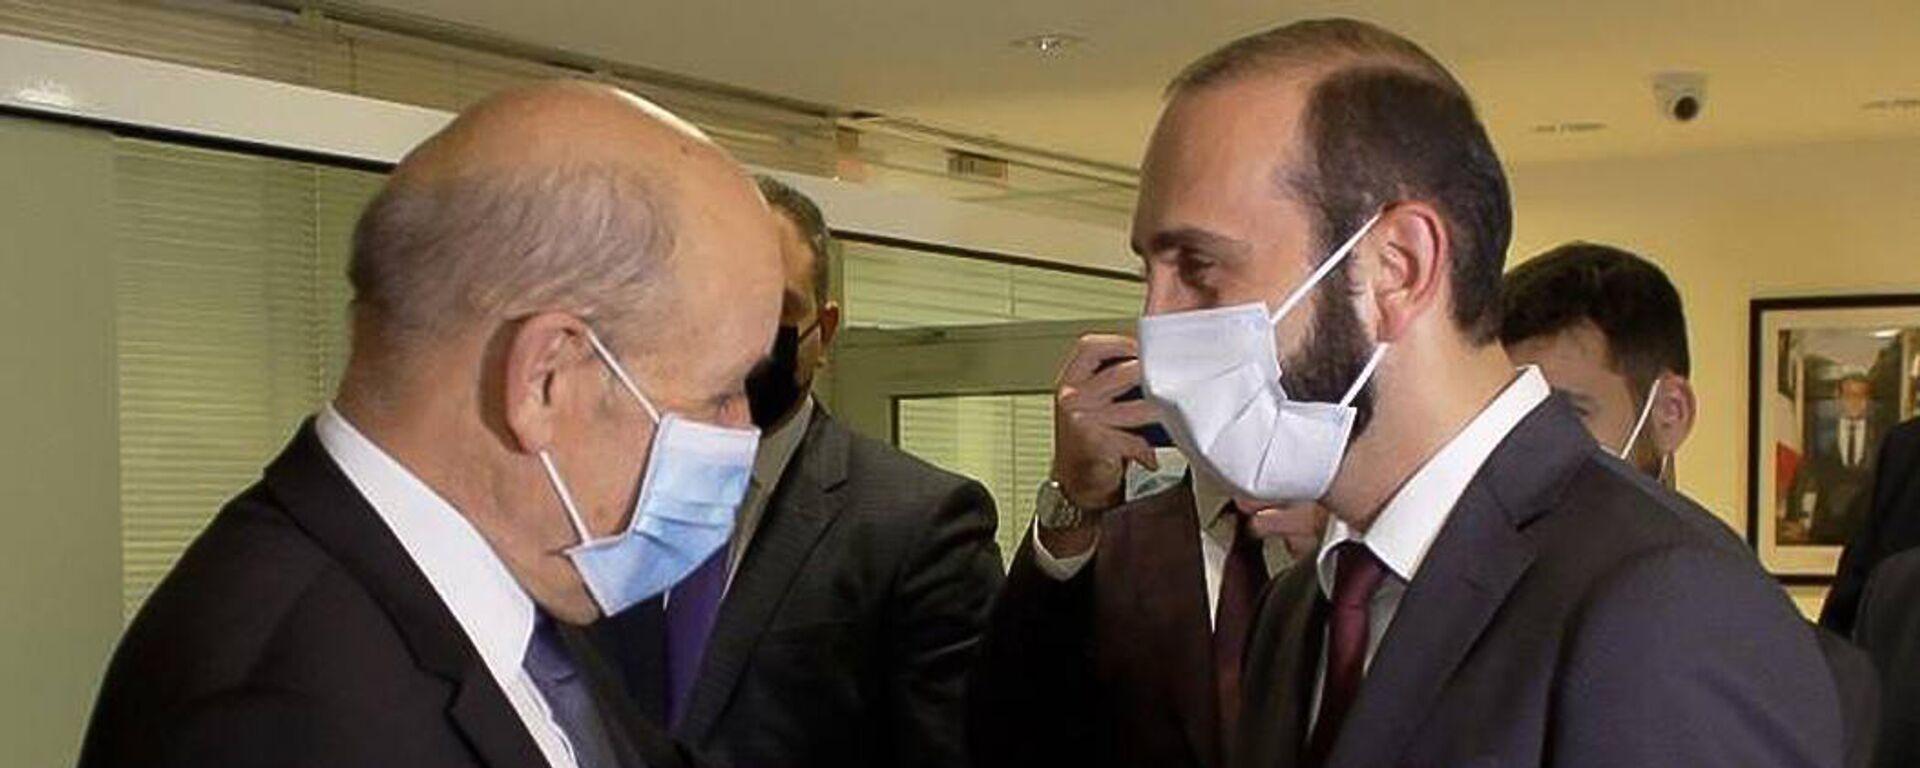 Встреча глав МИД Армении и Франции Арарата Мирзояна и Жана-Ив Ле Дриана (22 сентября 2021). Нью-Йорк - Sputnik Армения, 1920, 23.09.2021